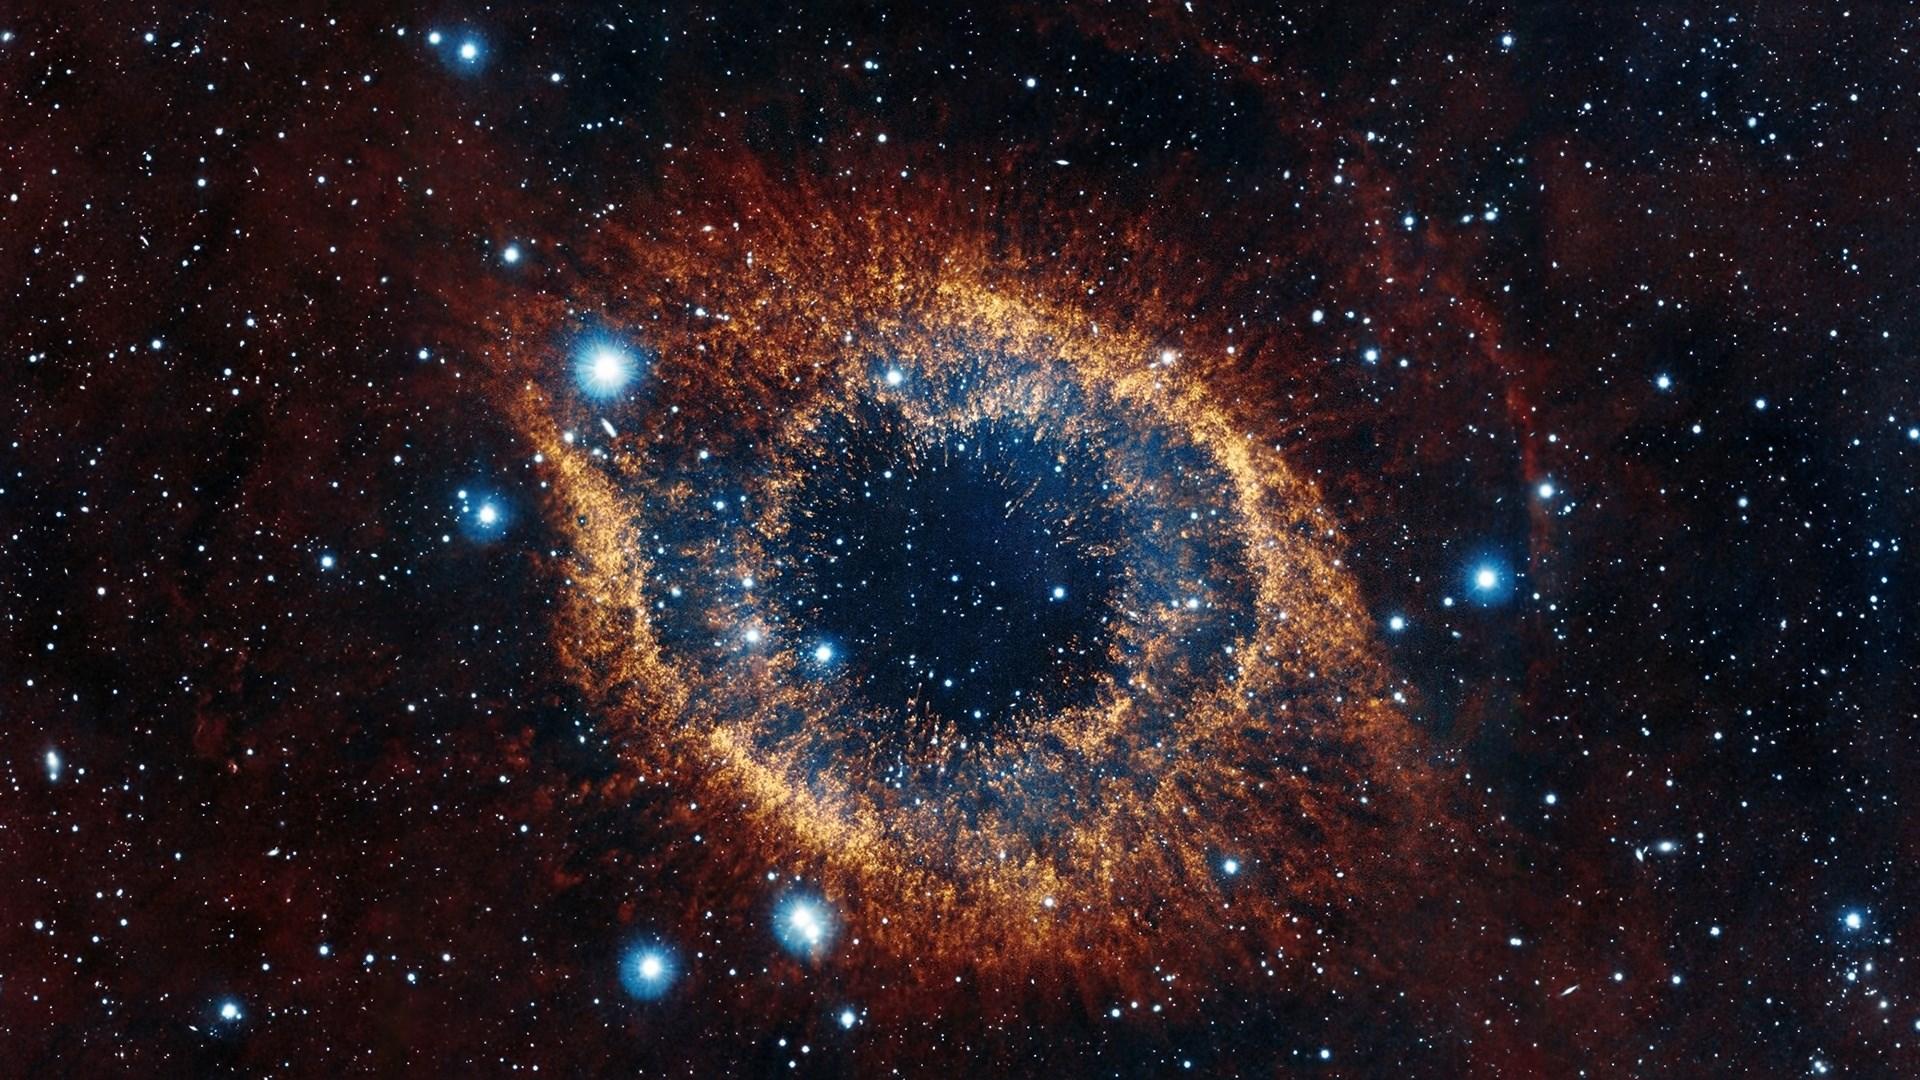 Space clipart 1920x1080 nebula.